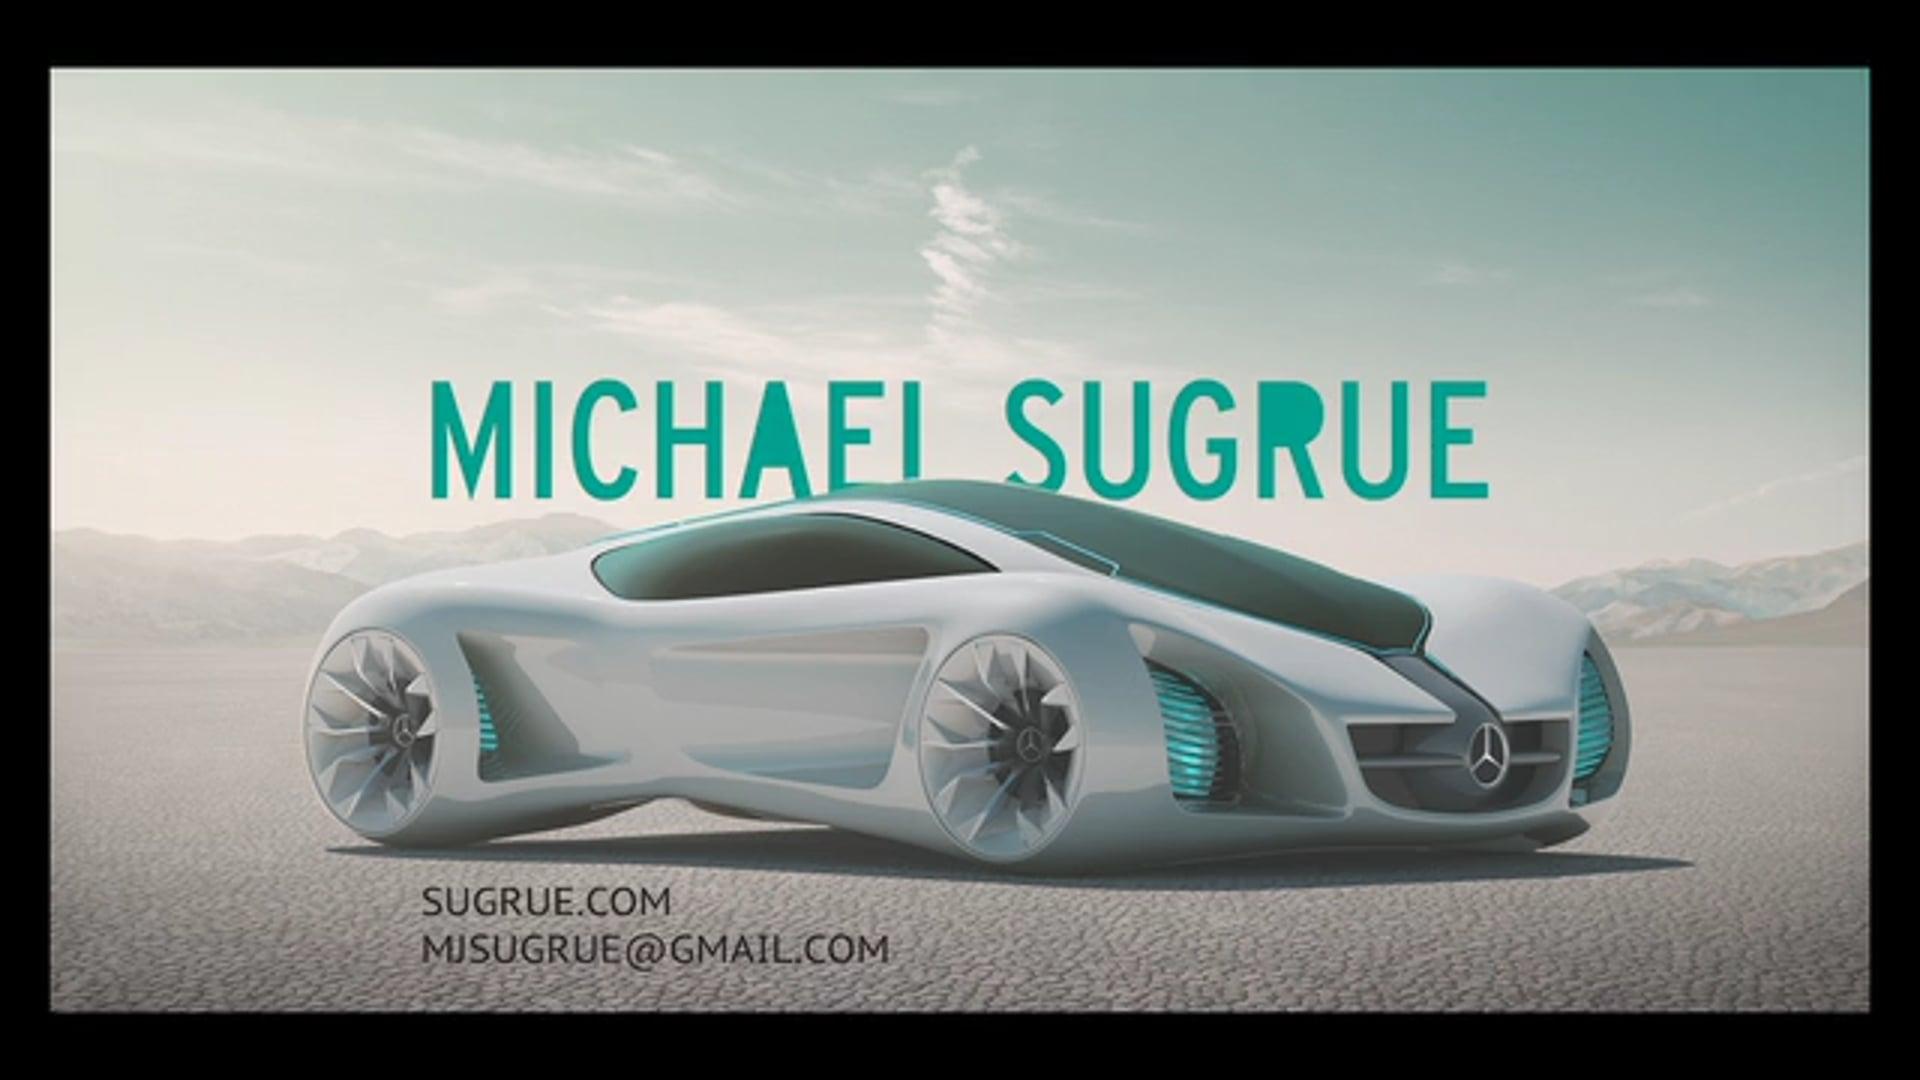 Michael Sugrue - Stills